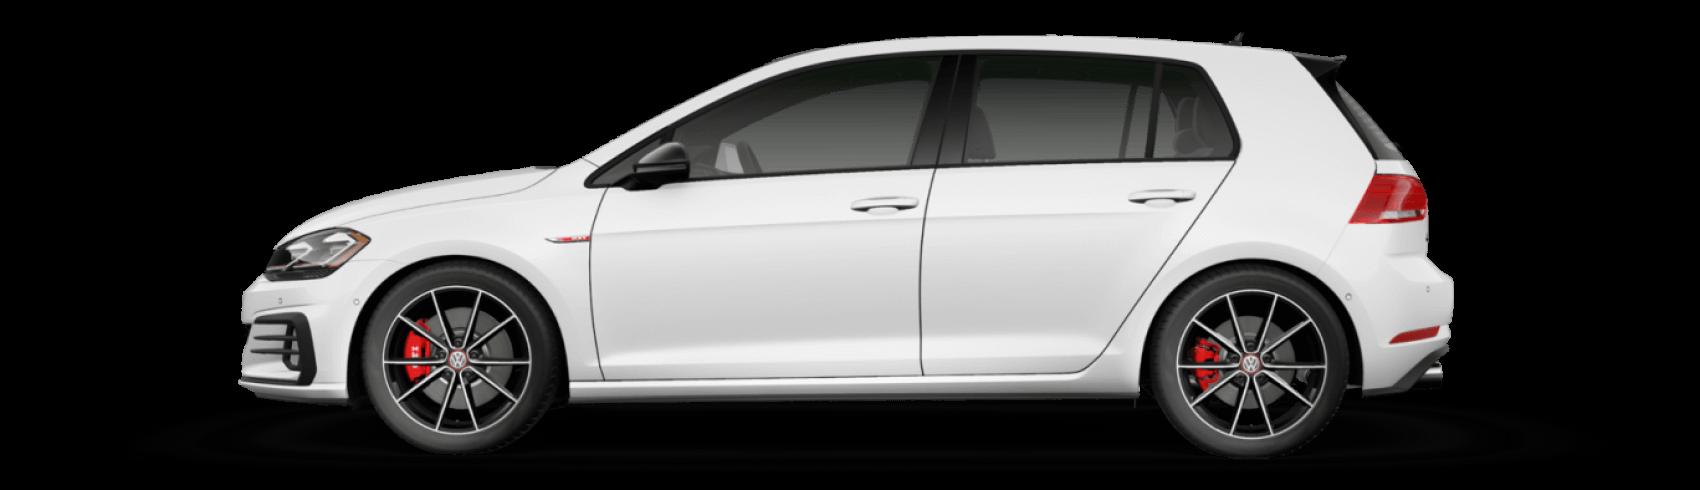 2021 Volkswagen Golf GTI White Toms River VW